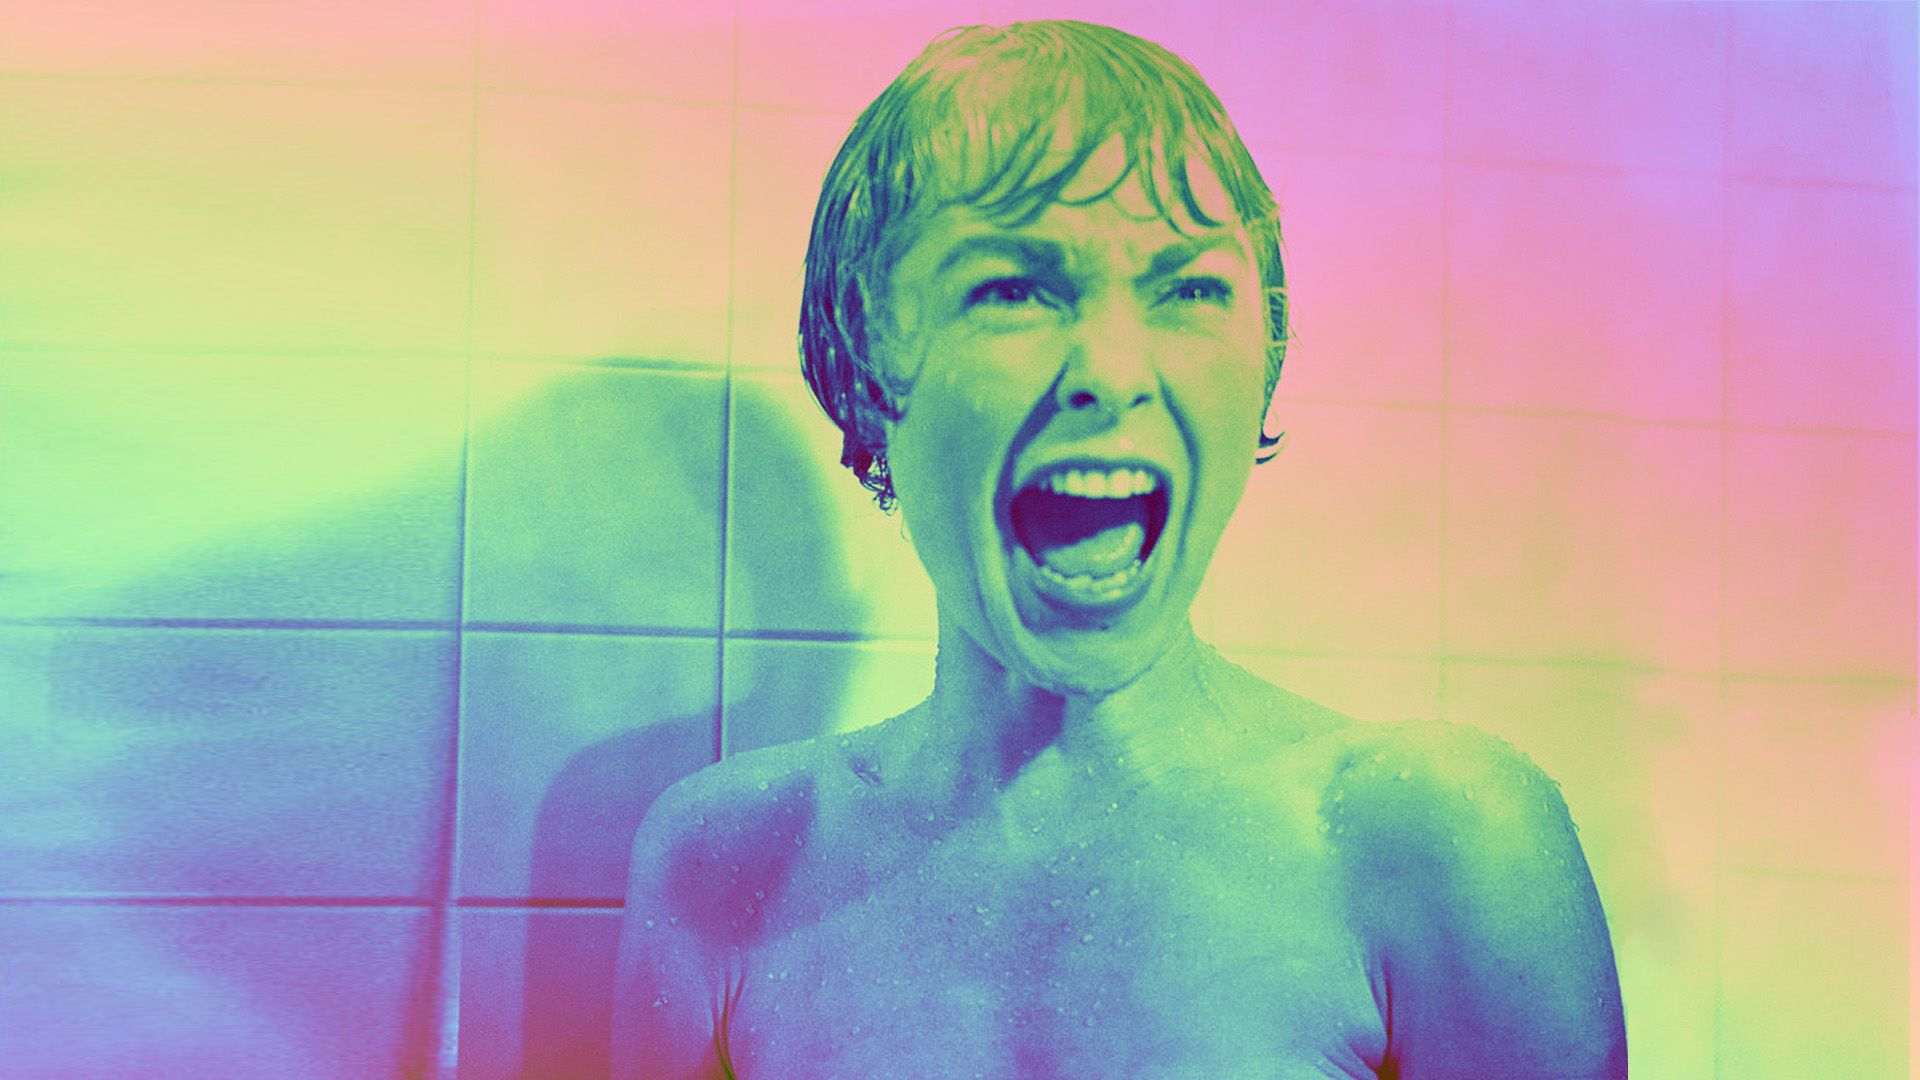 Marion Crane zuhanyzós jelenete